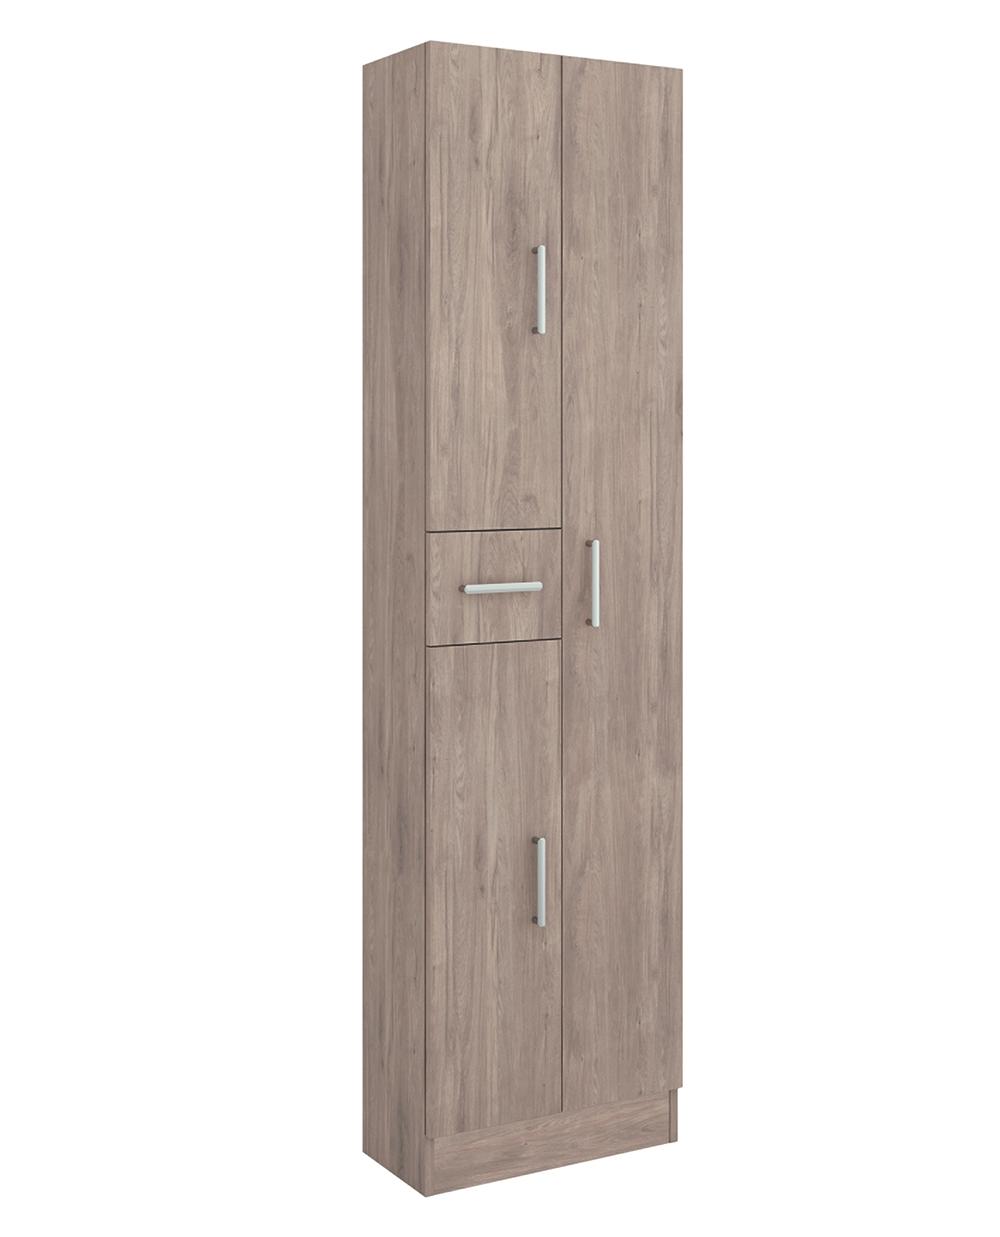 Muebles Auxi hoge opbergkast Colorado 180x48x24cm 3 deuren 1 lade